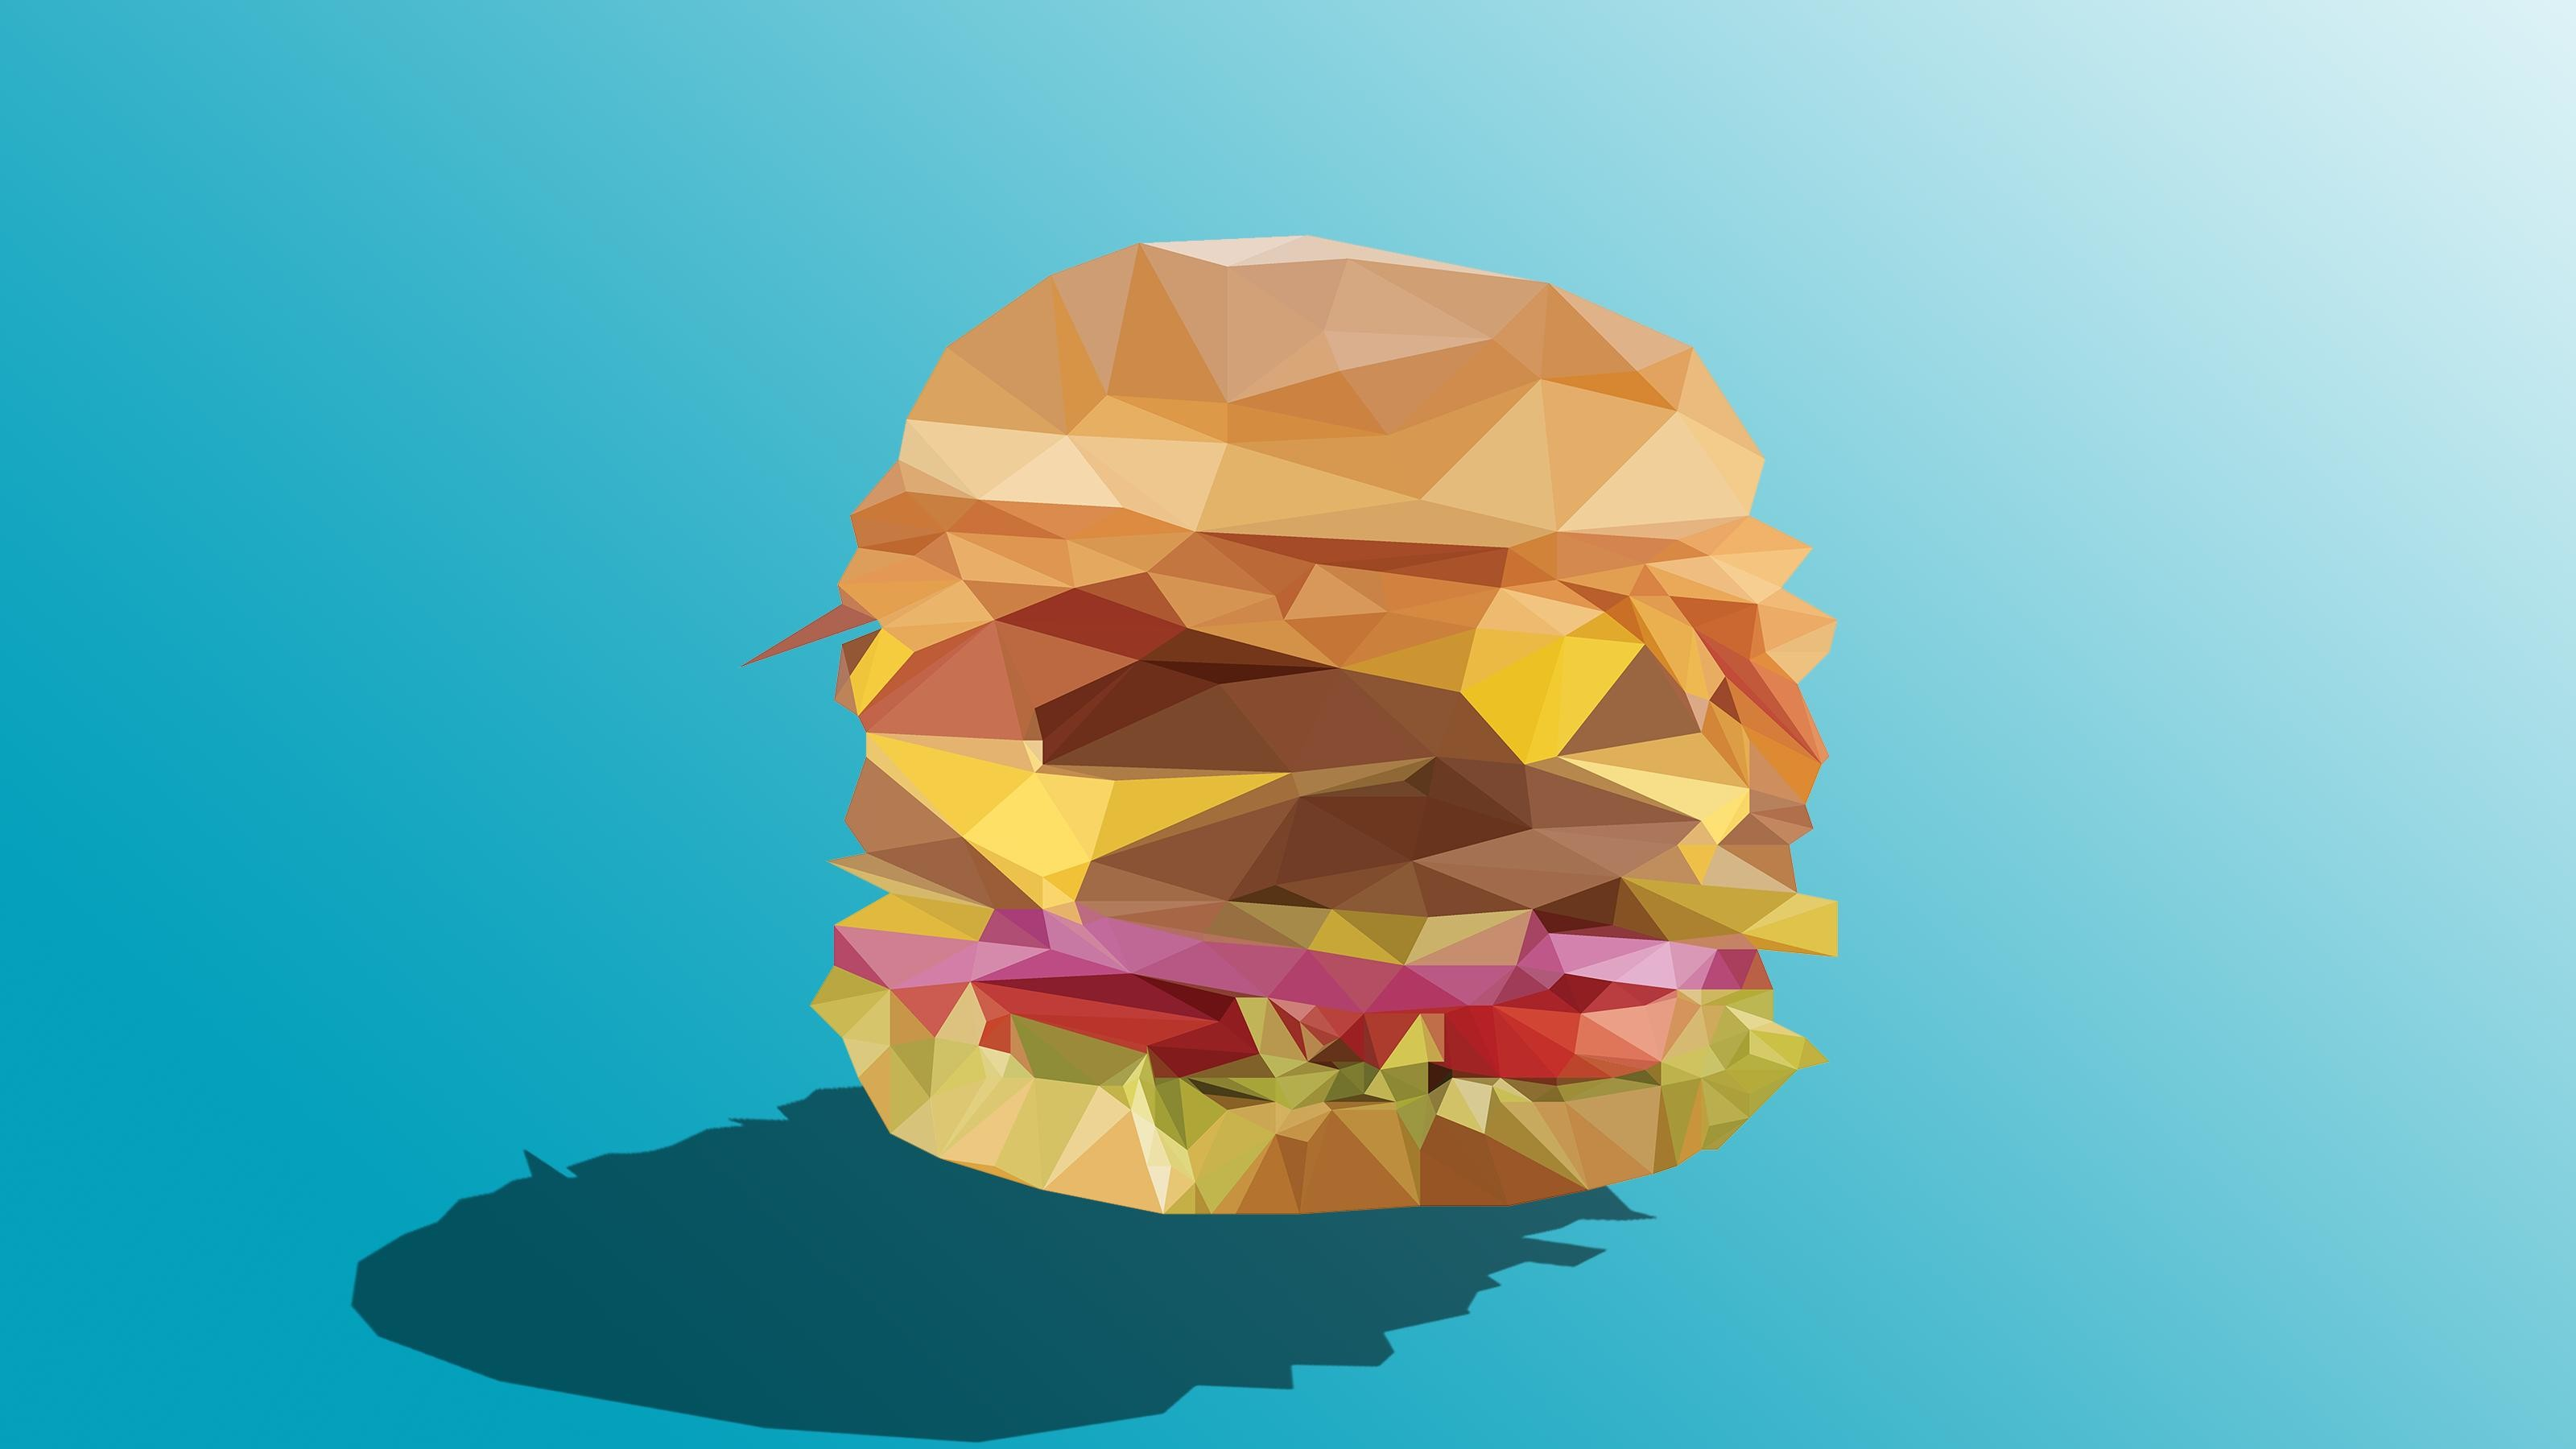 Res: 3200x1800, Low Poly Burger (3200 x 1800) ...